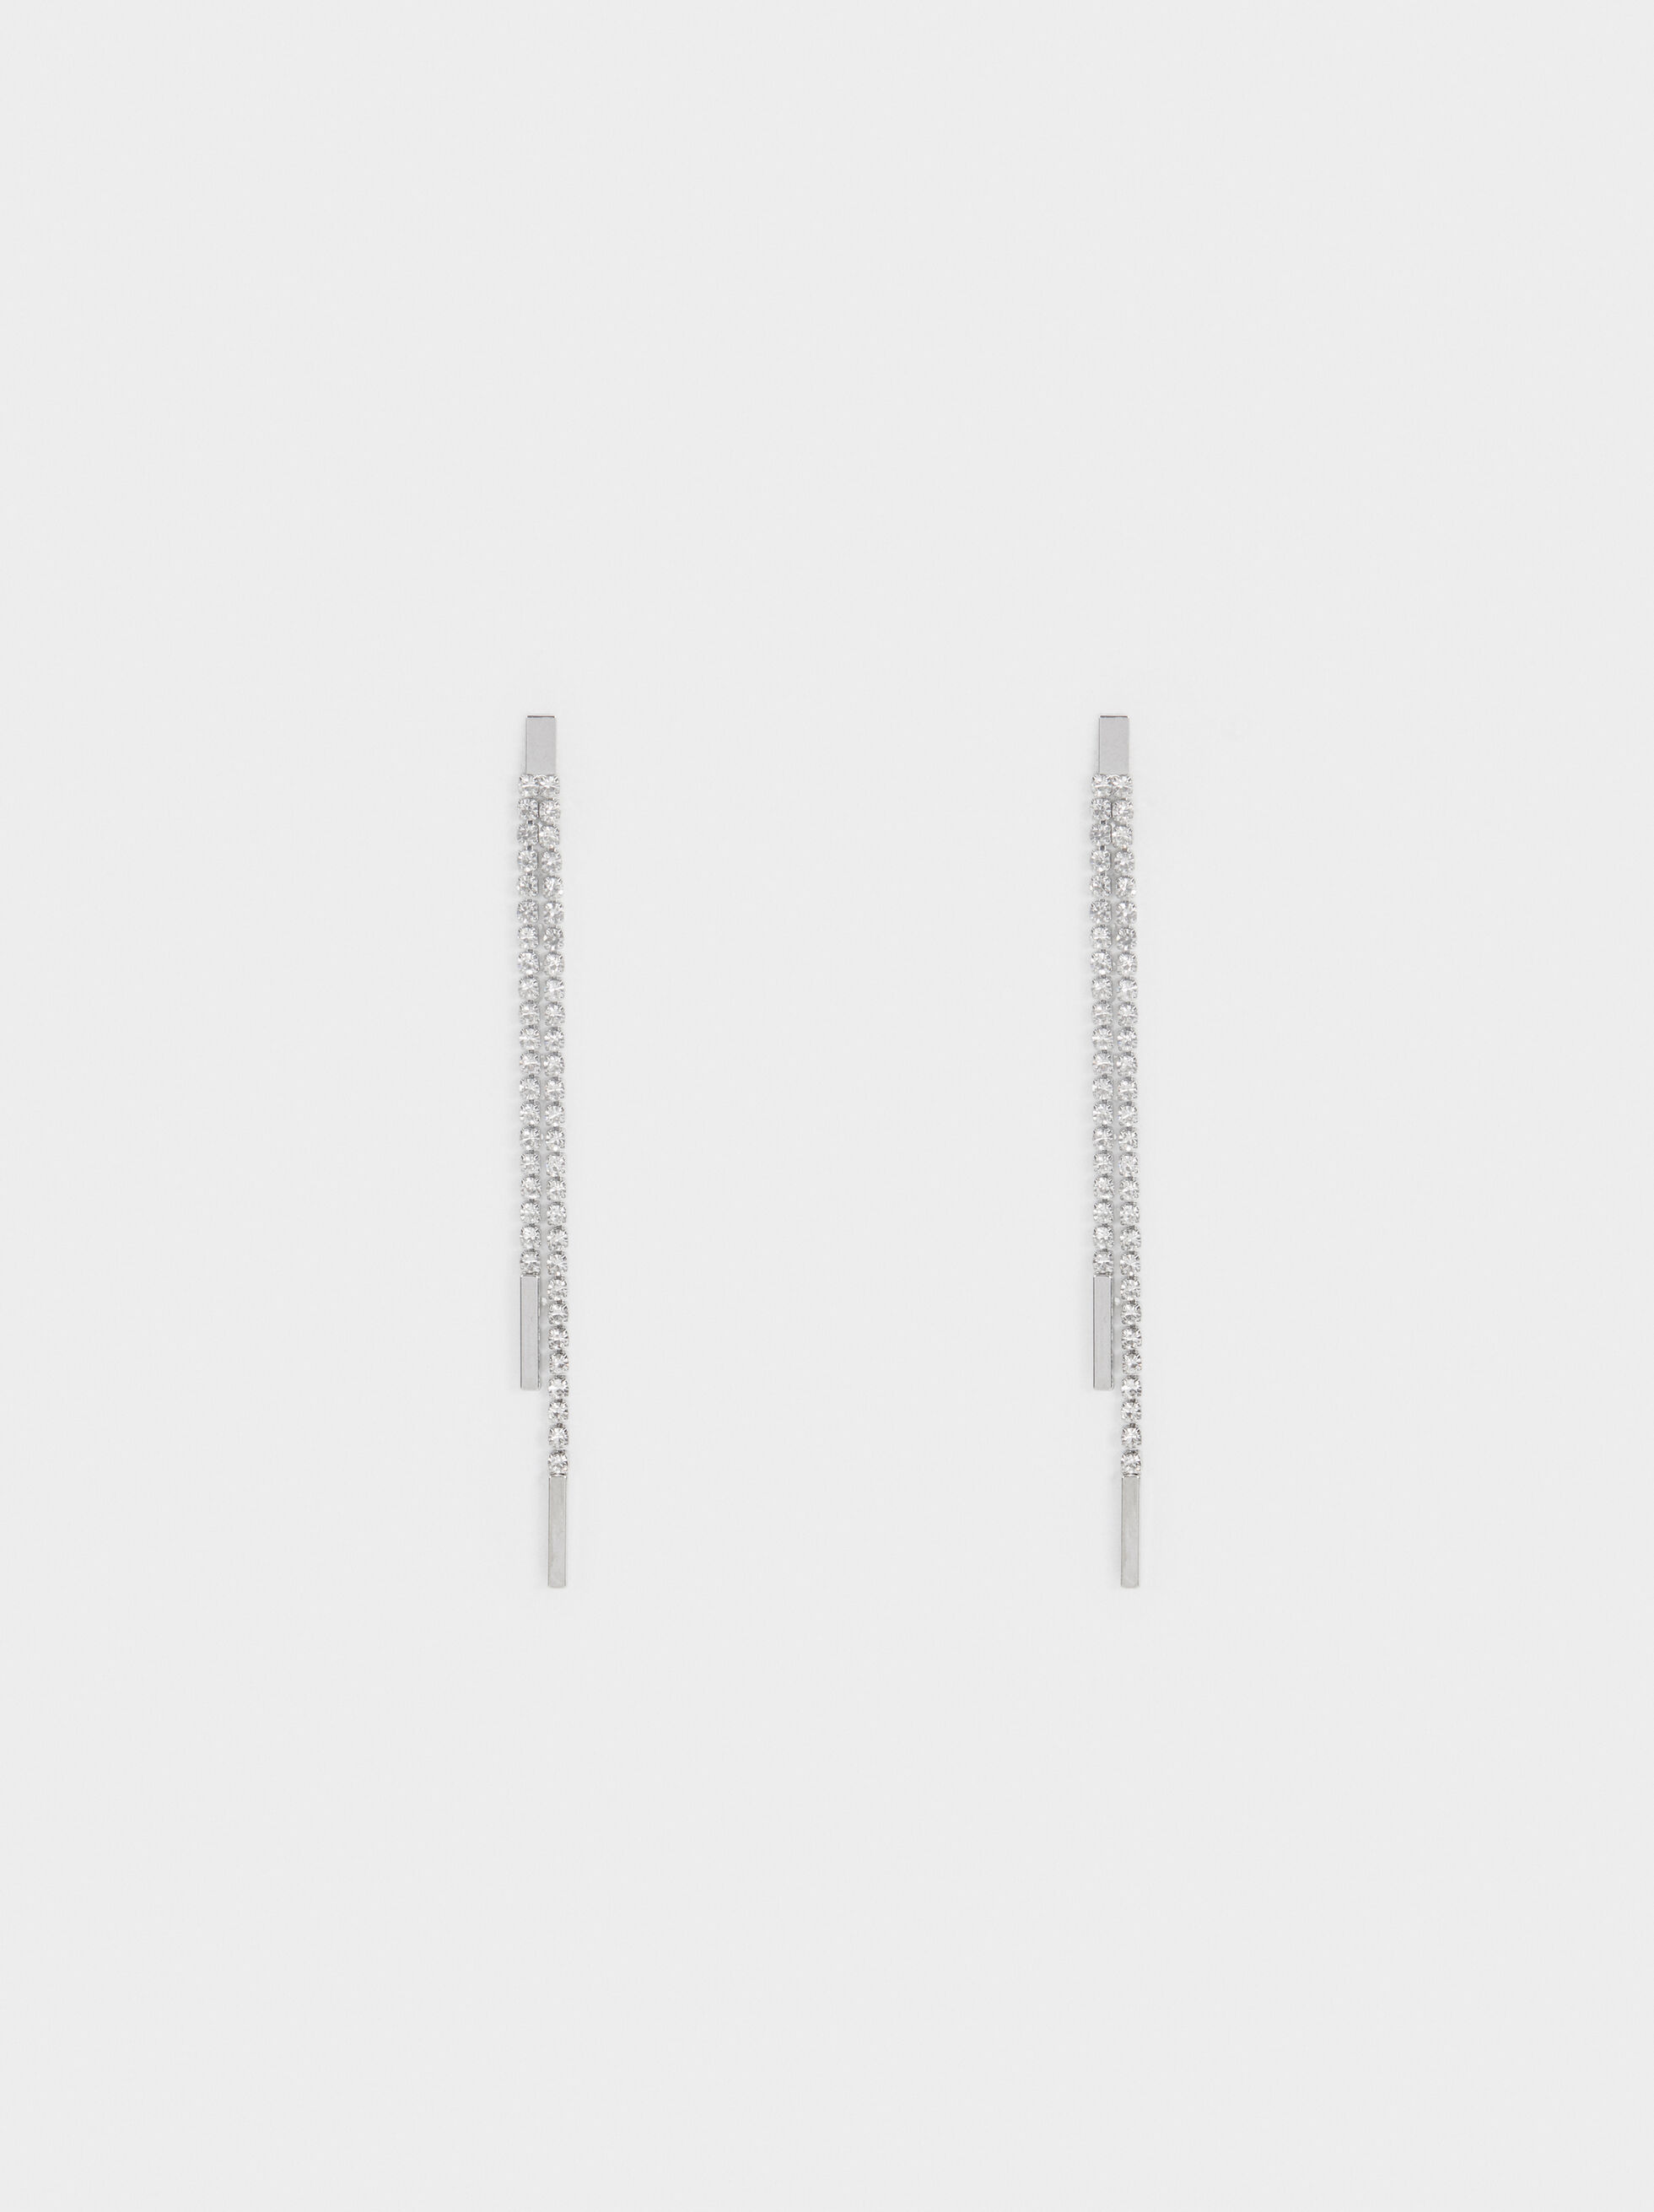 Long Rhinestone Earrings, Silver, hi-res